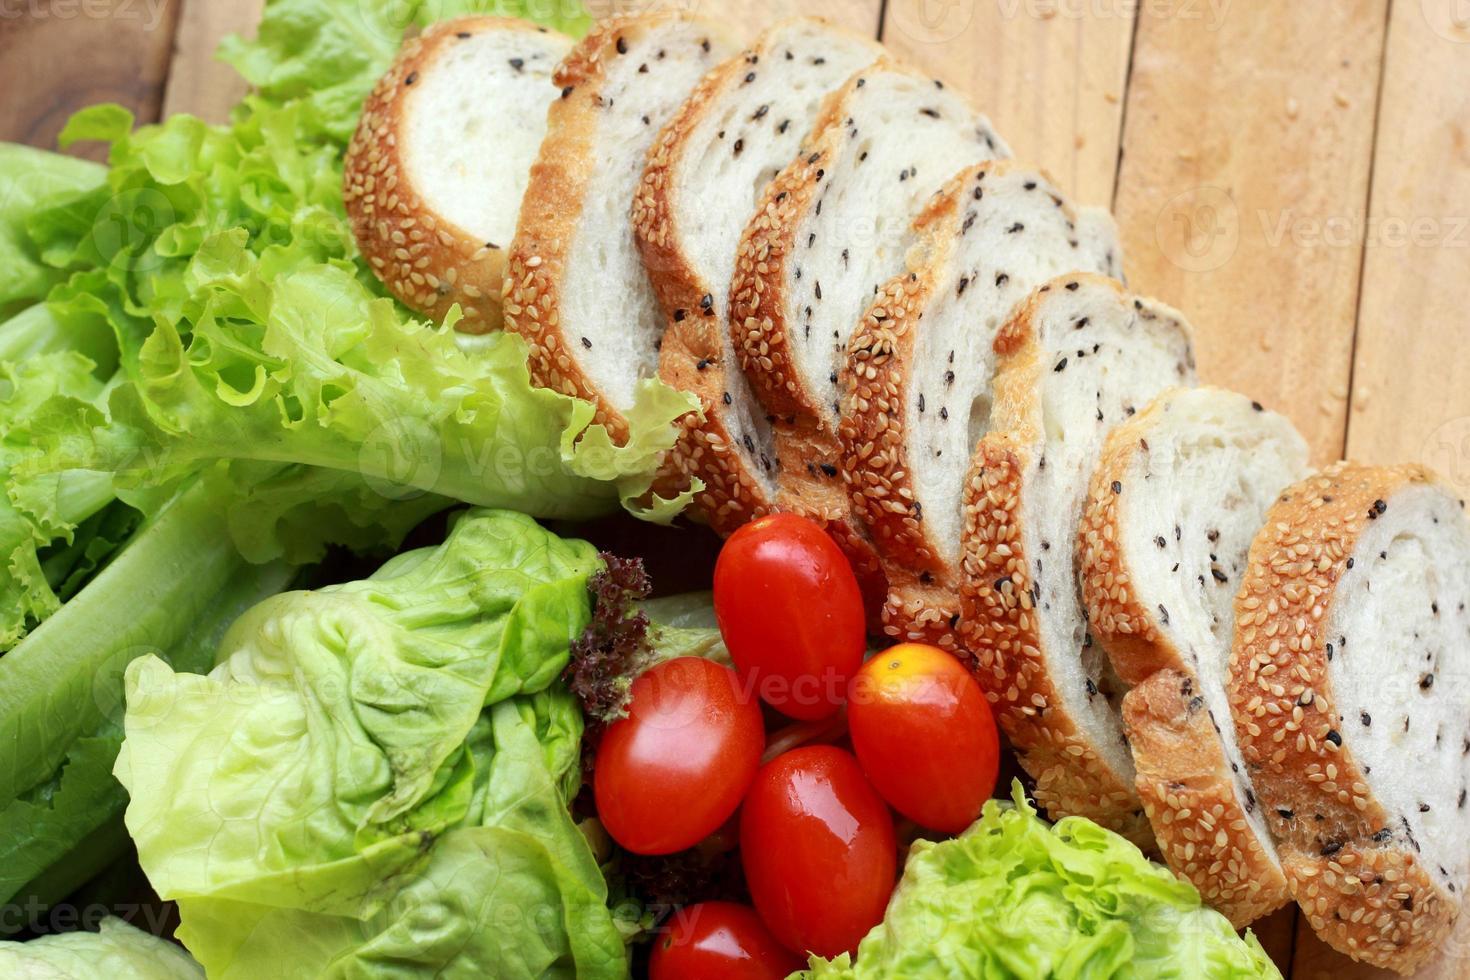 pane cosparso di sesamo - insalata verde vegetale foto